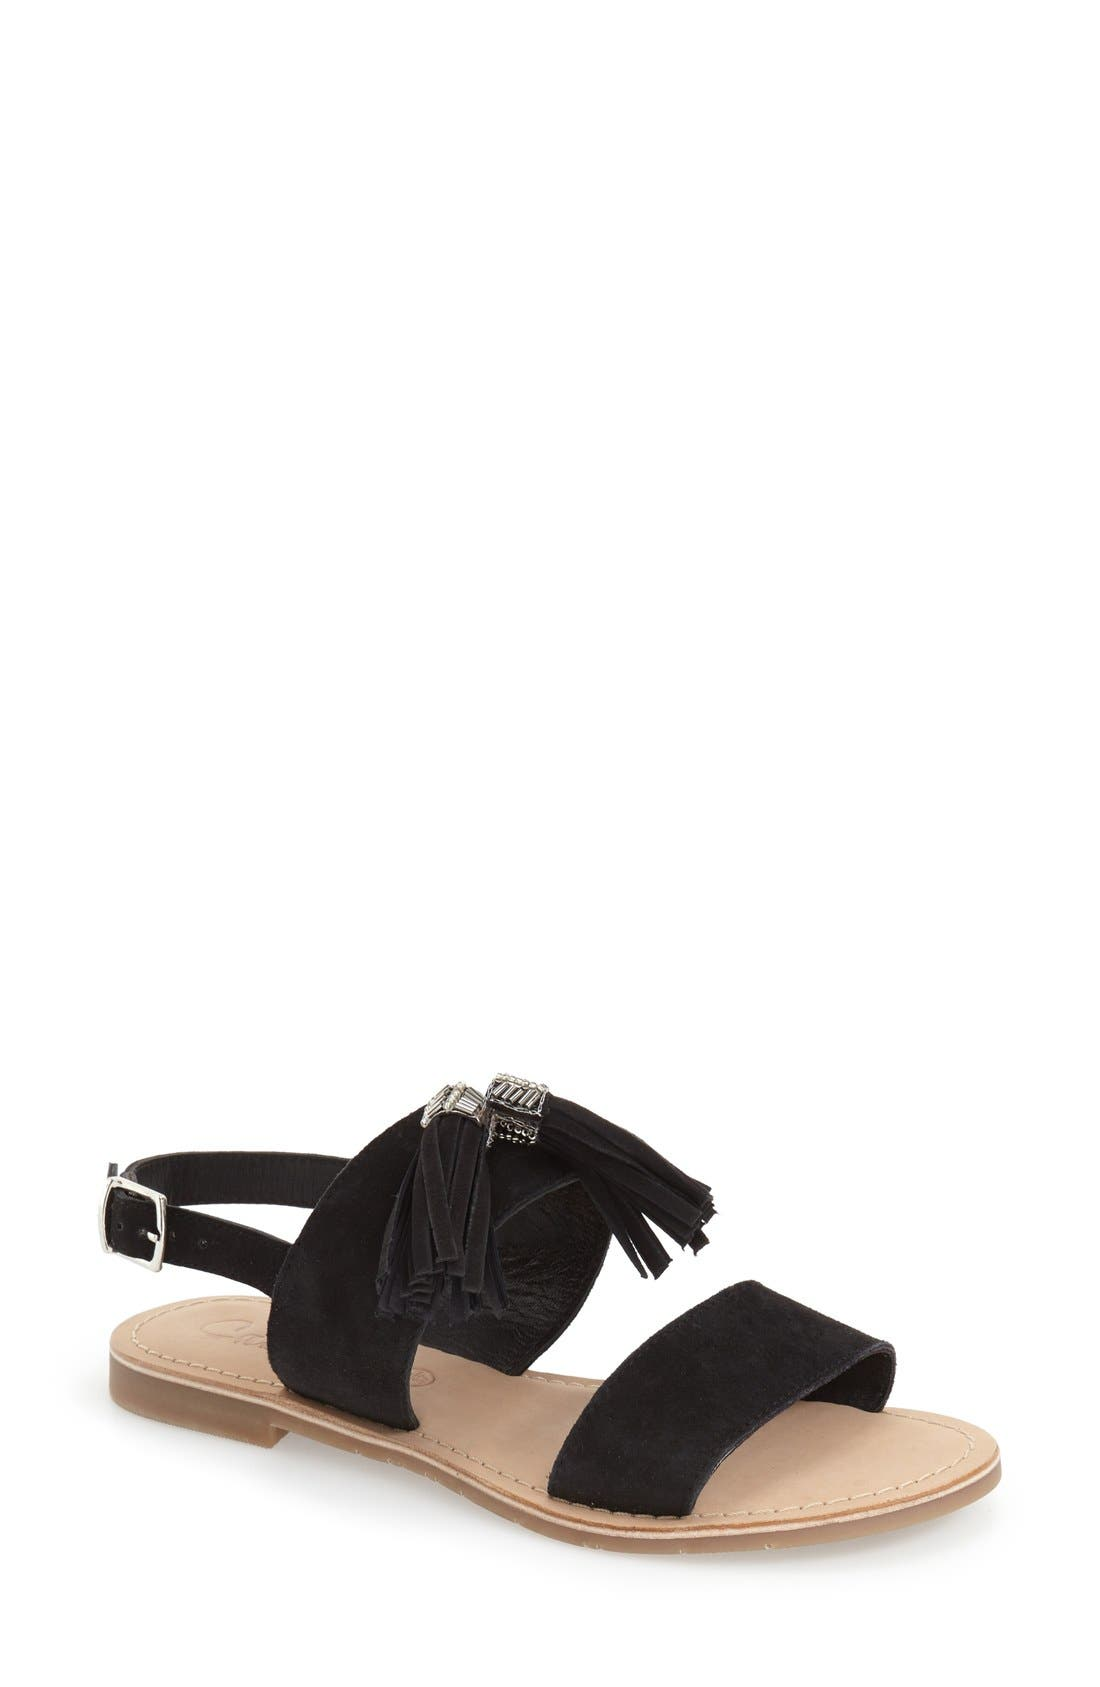 CALLISTO 'Anandi' Tassel Flat Sandal, Main, color, 001